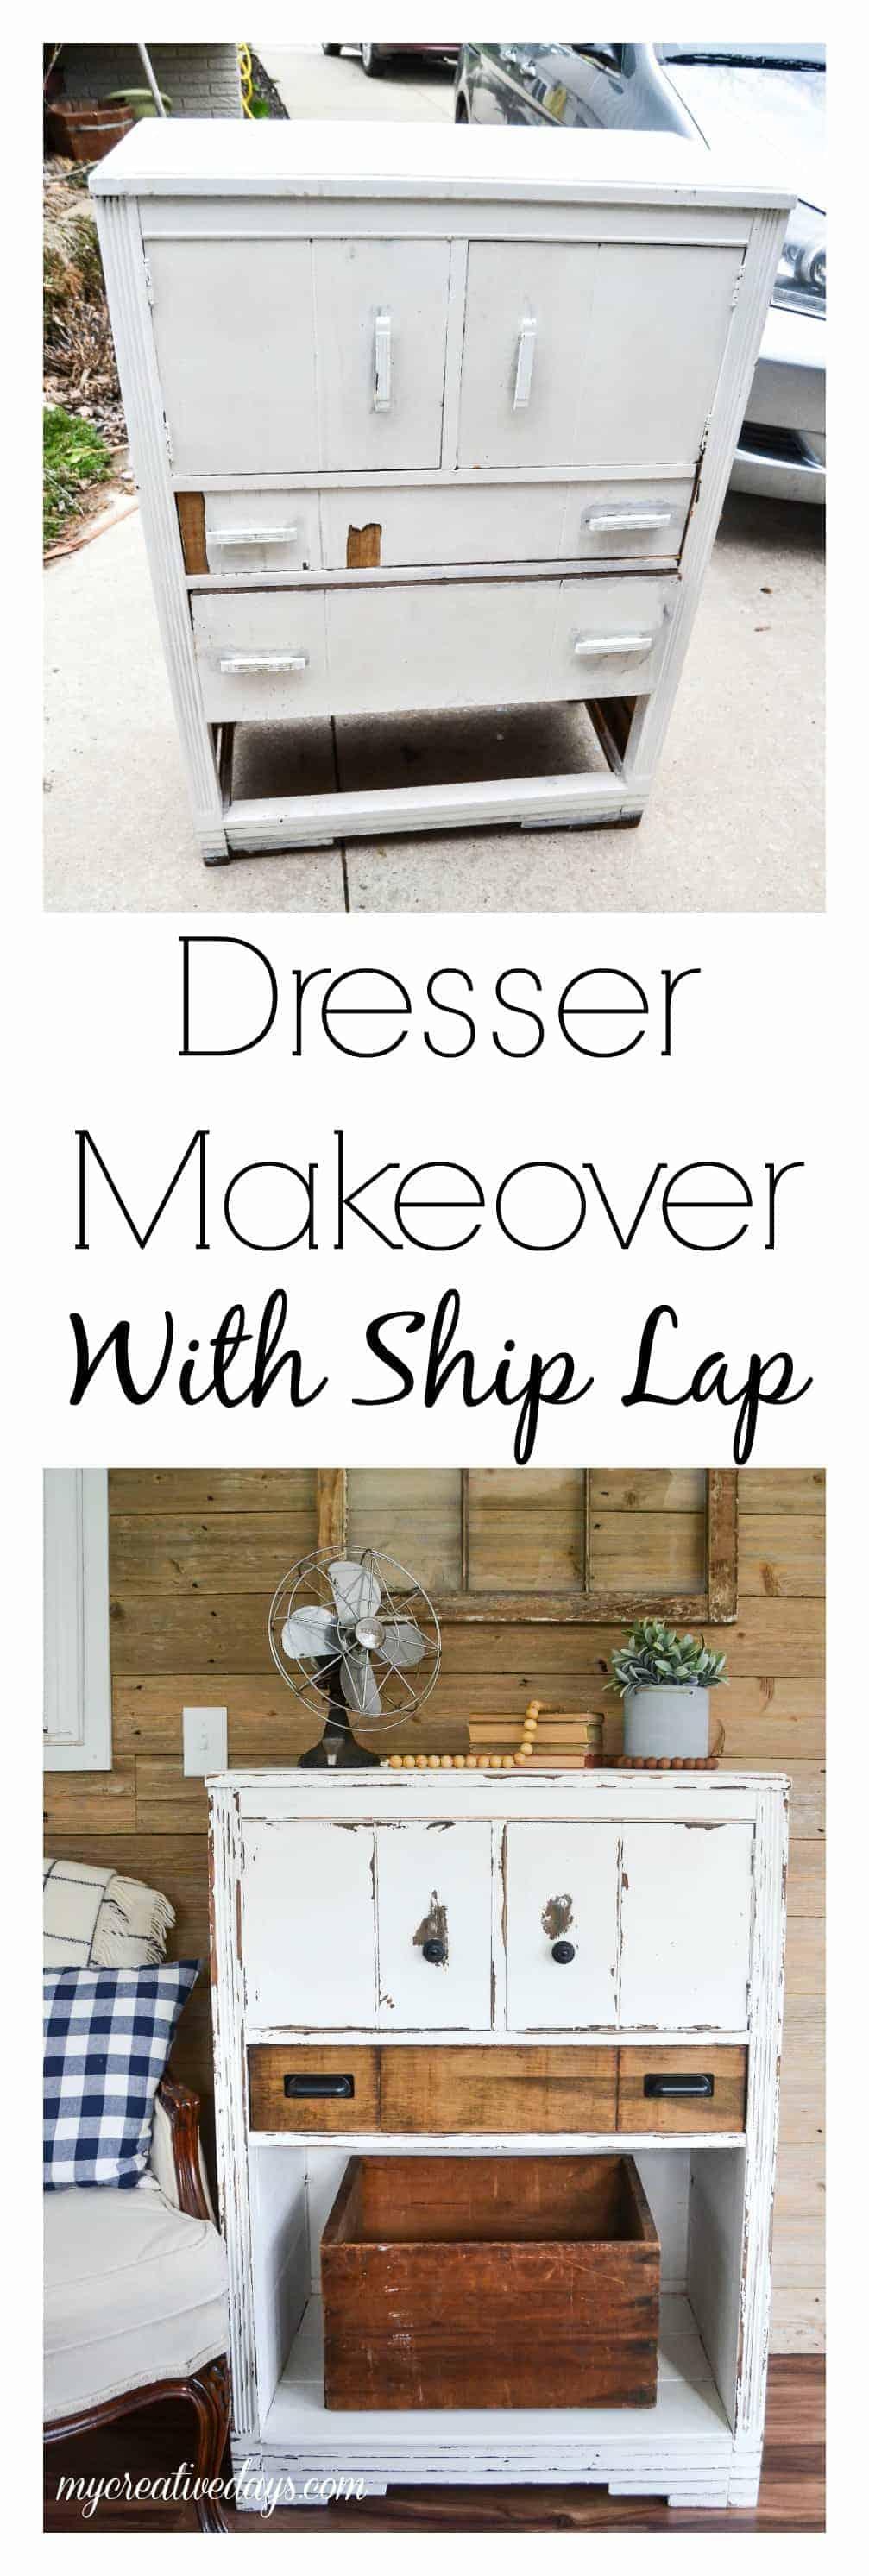 dresser makeover with ship lap my creative days. Black Bedroom Furniture Sets. Home Design Ideas